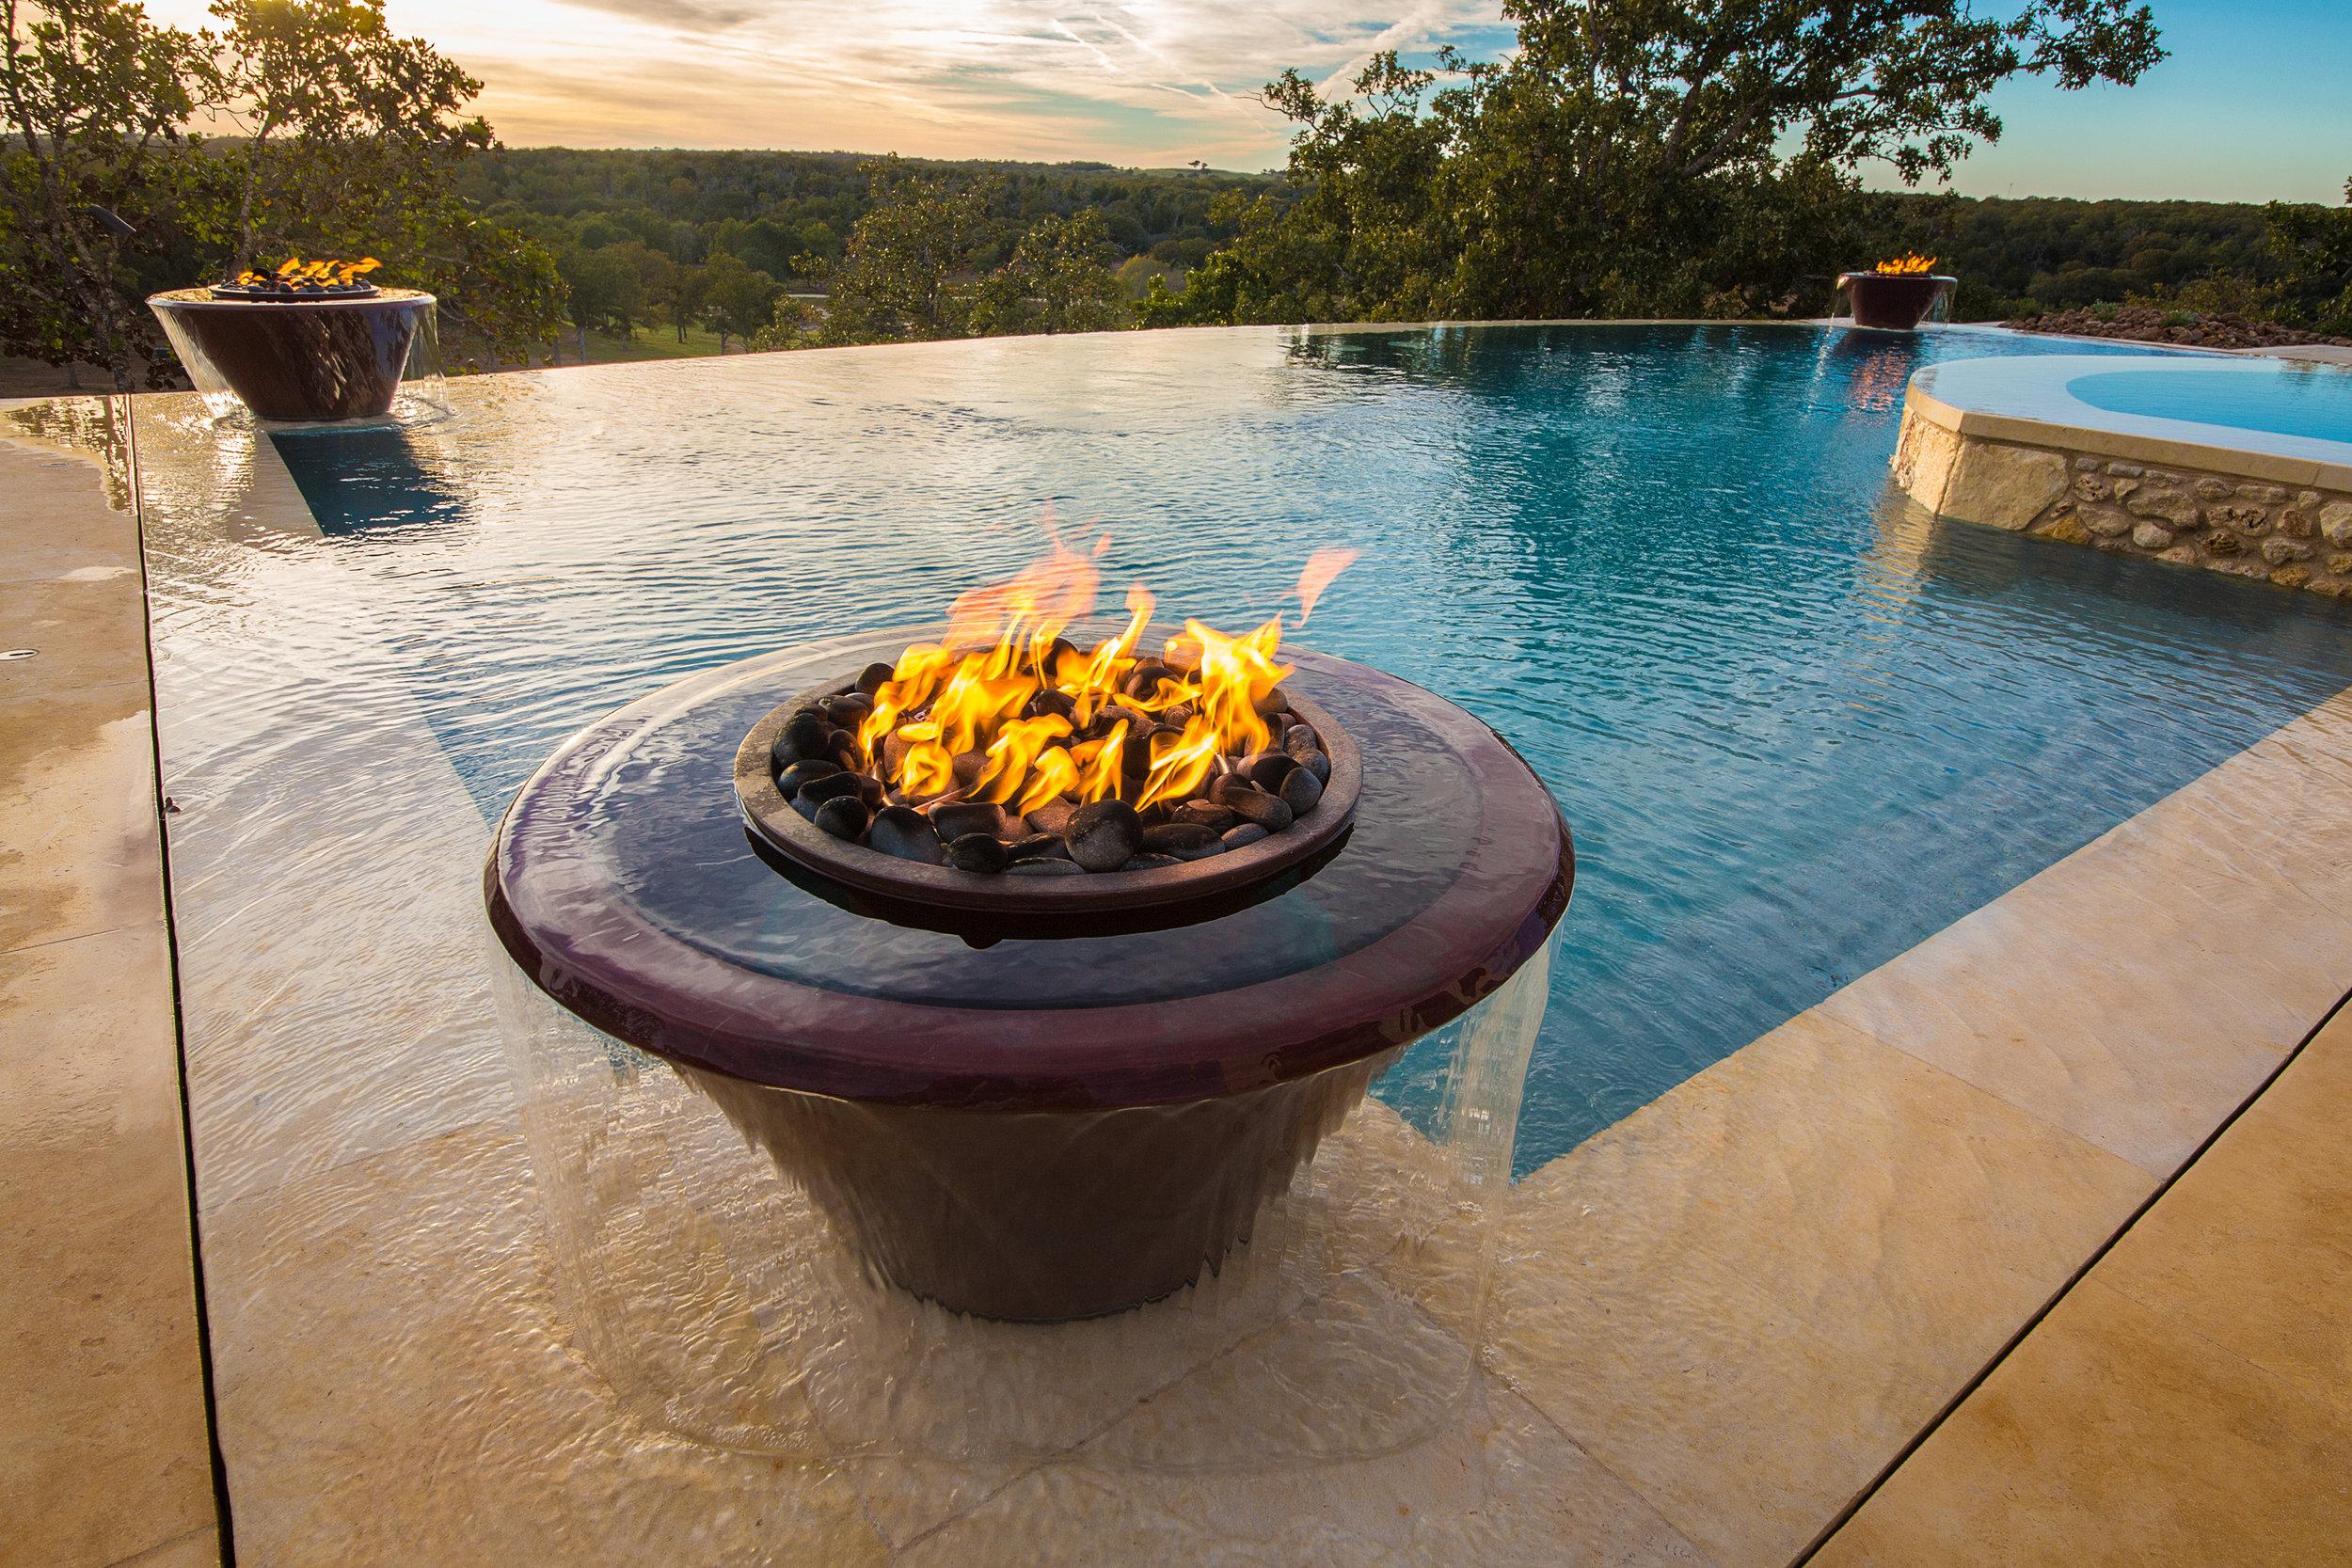 TORCH 360° - WATER & FIRE BOWLS